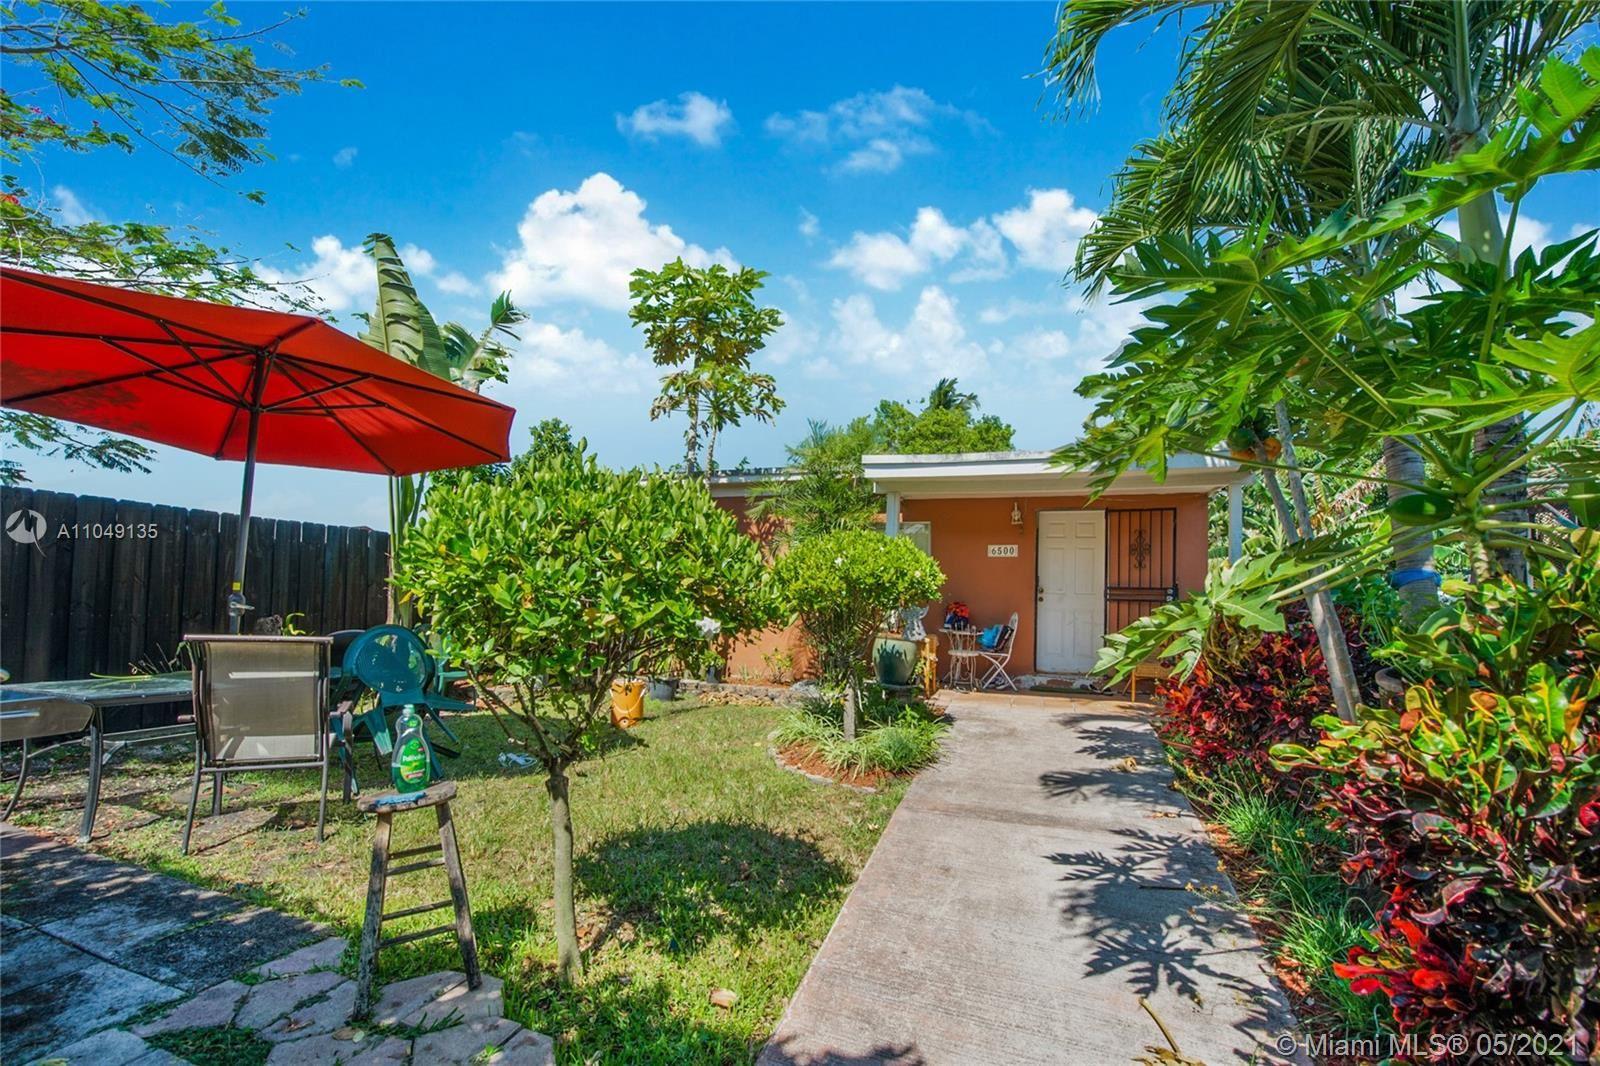 6500 SW 122nd Ave, Miami, FL 33183 - #: A11049135